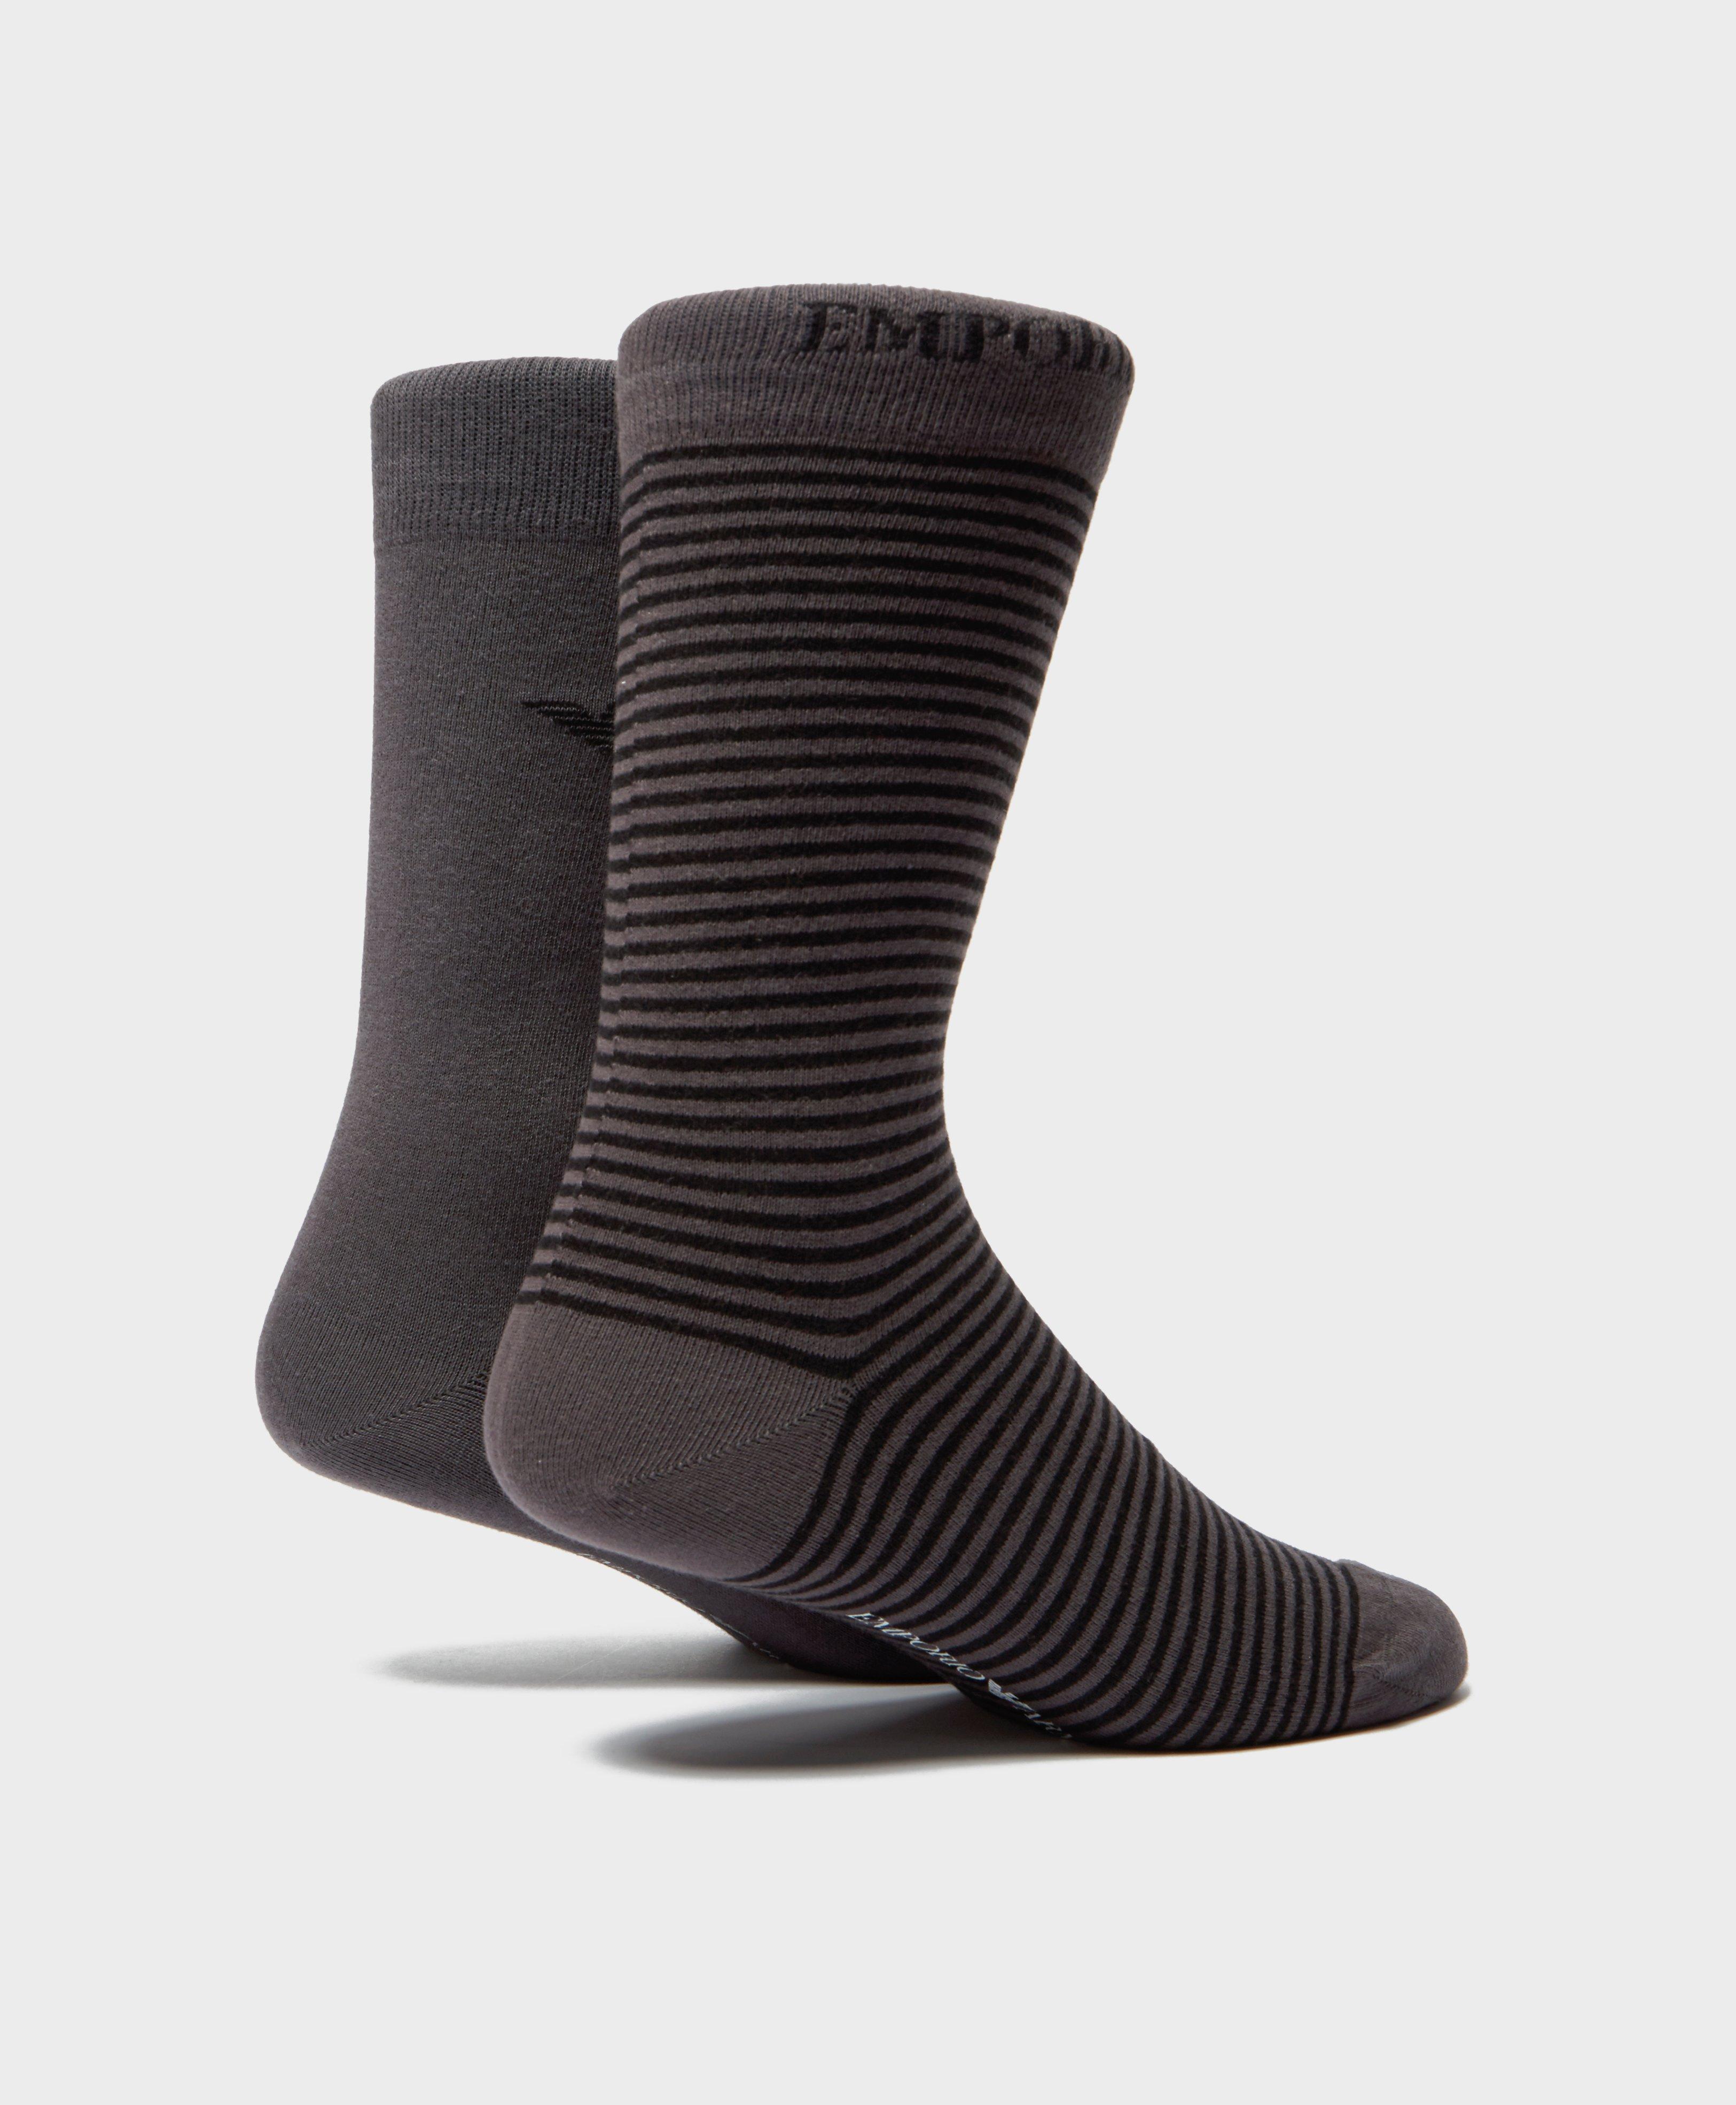 16e8883c130 Lyst - Emporio Armani 2-pack Stripe Socks in Black for Men